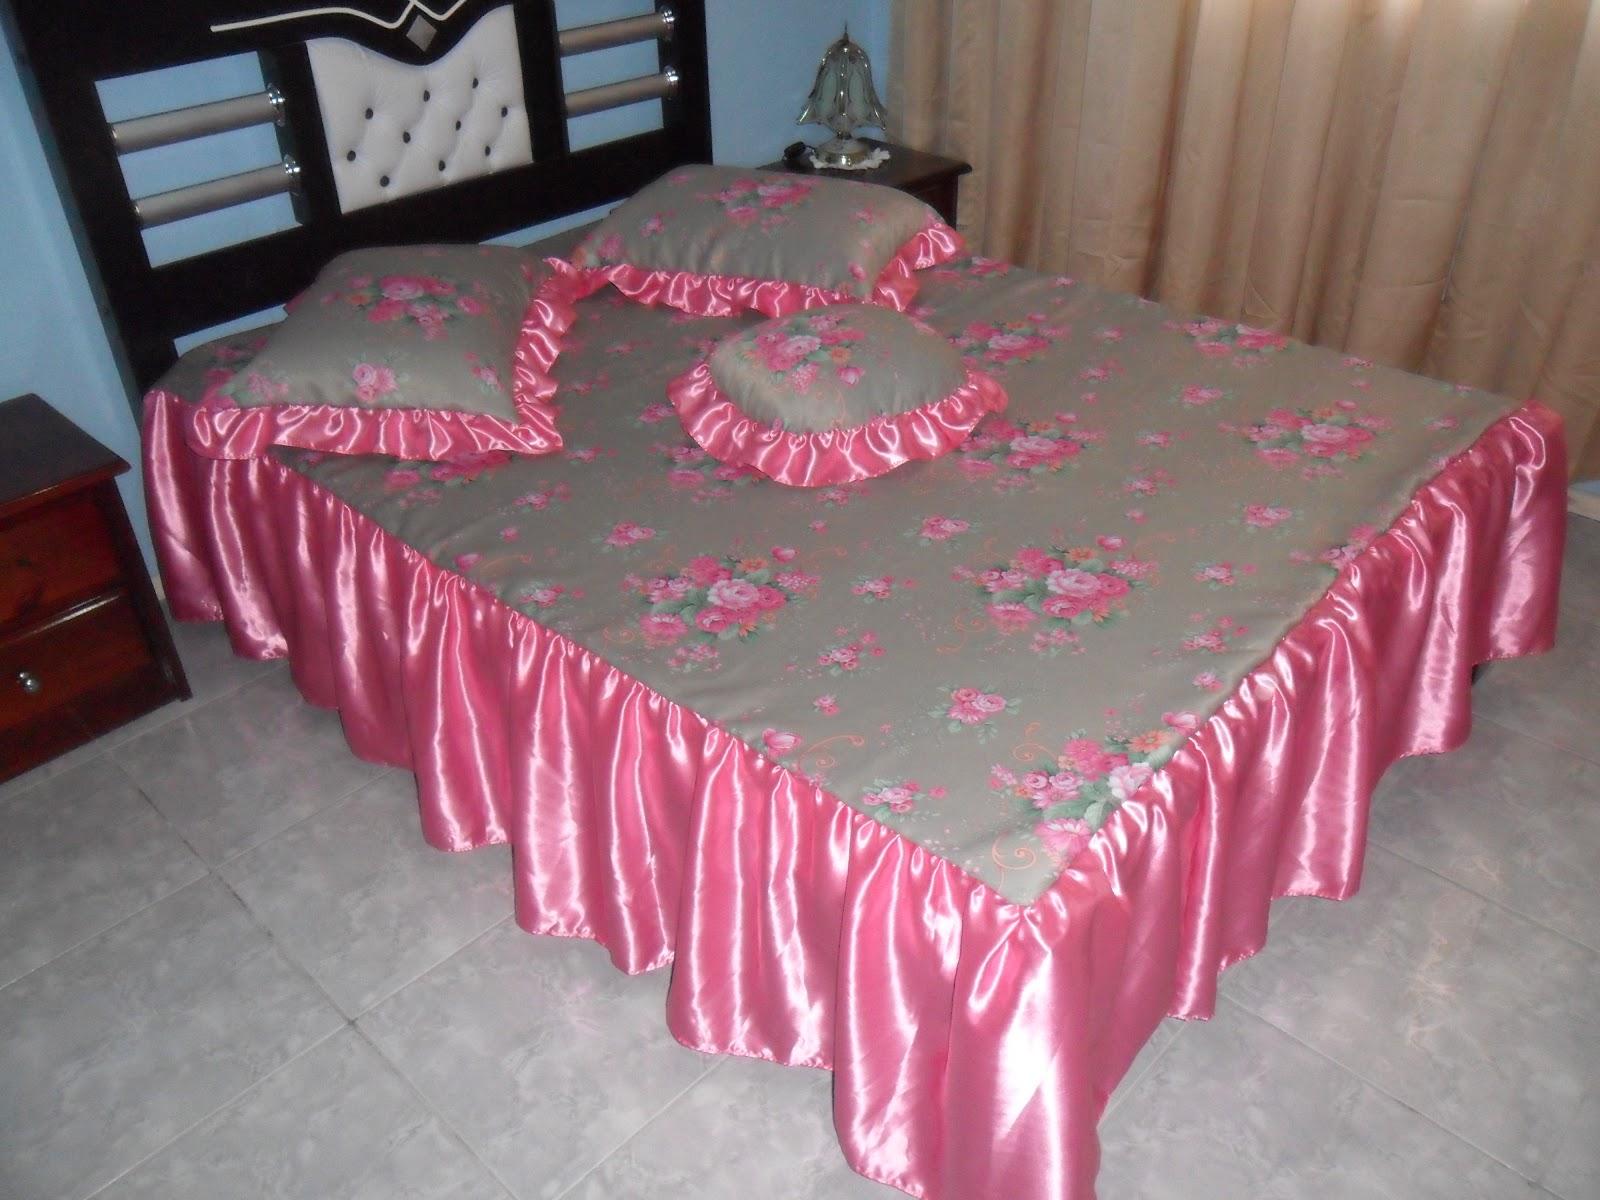 Arte e atelier conjunto de colcha cama casal rosa - Imagenes de colchas para camas ...